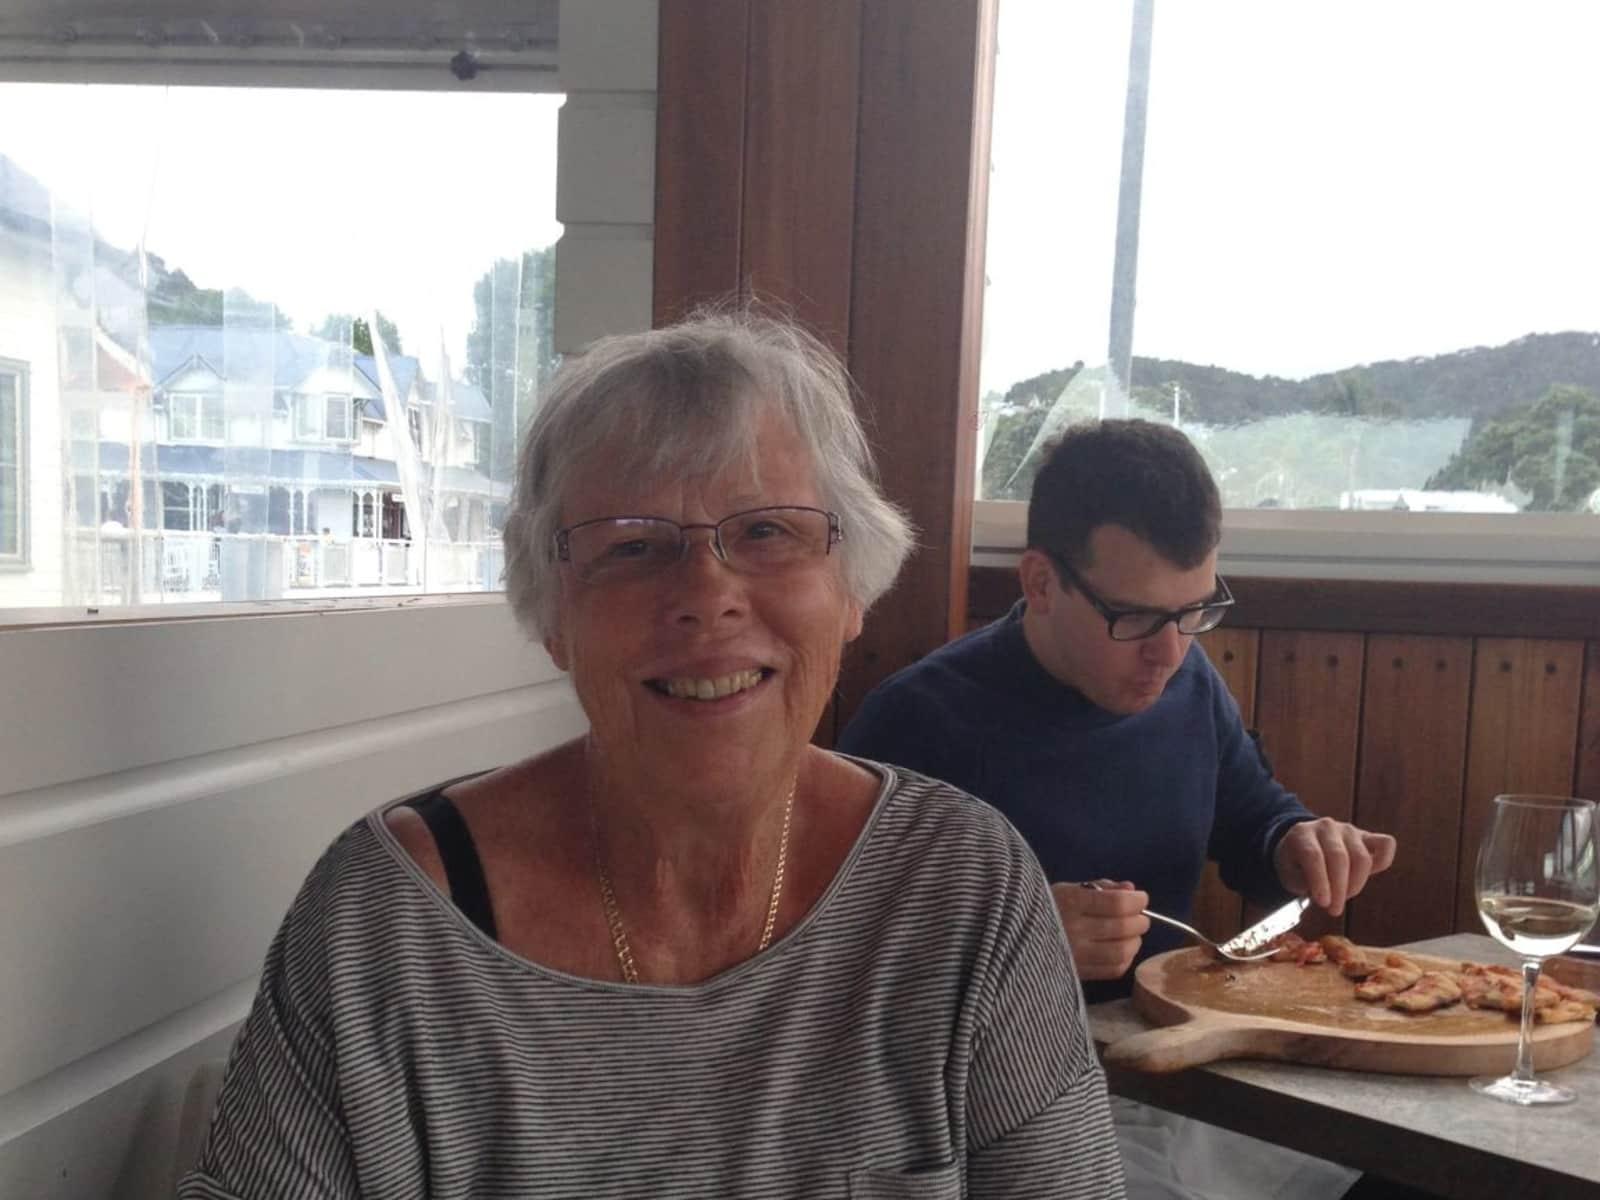 Lynn from Auckland, New Zealand